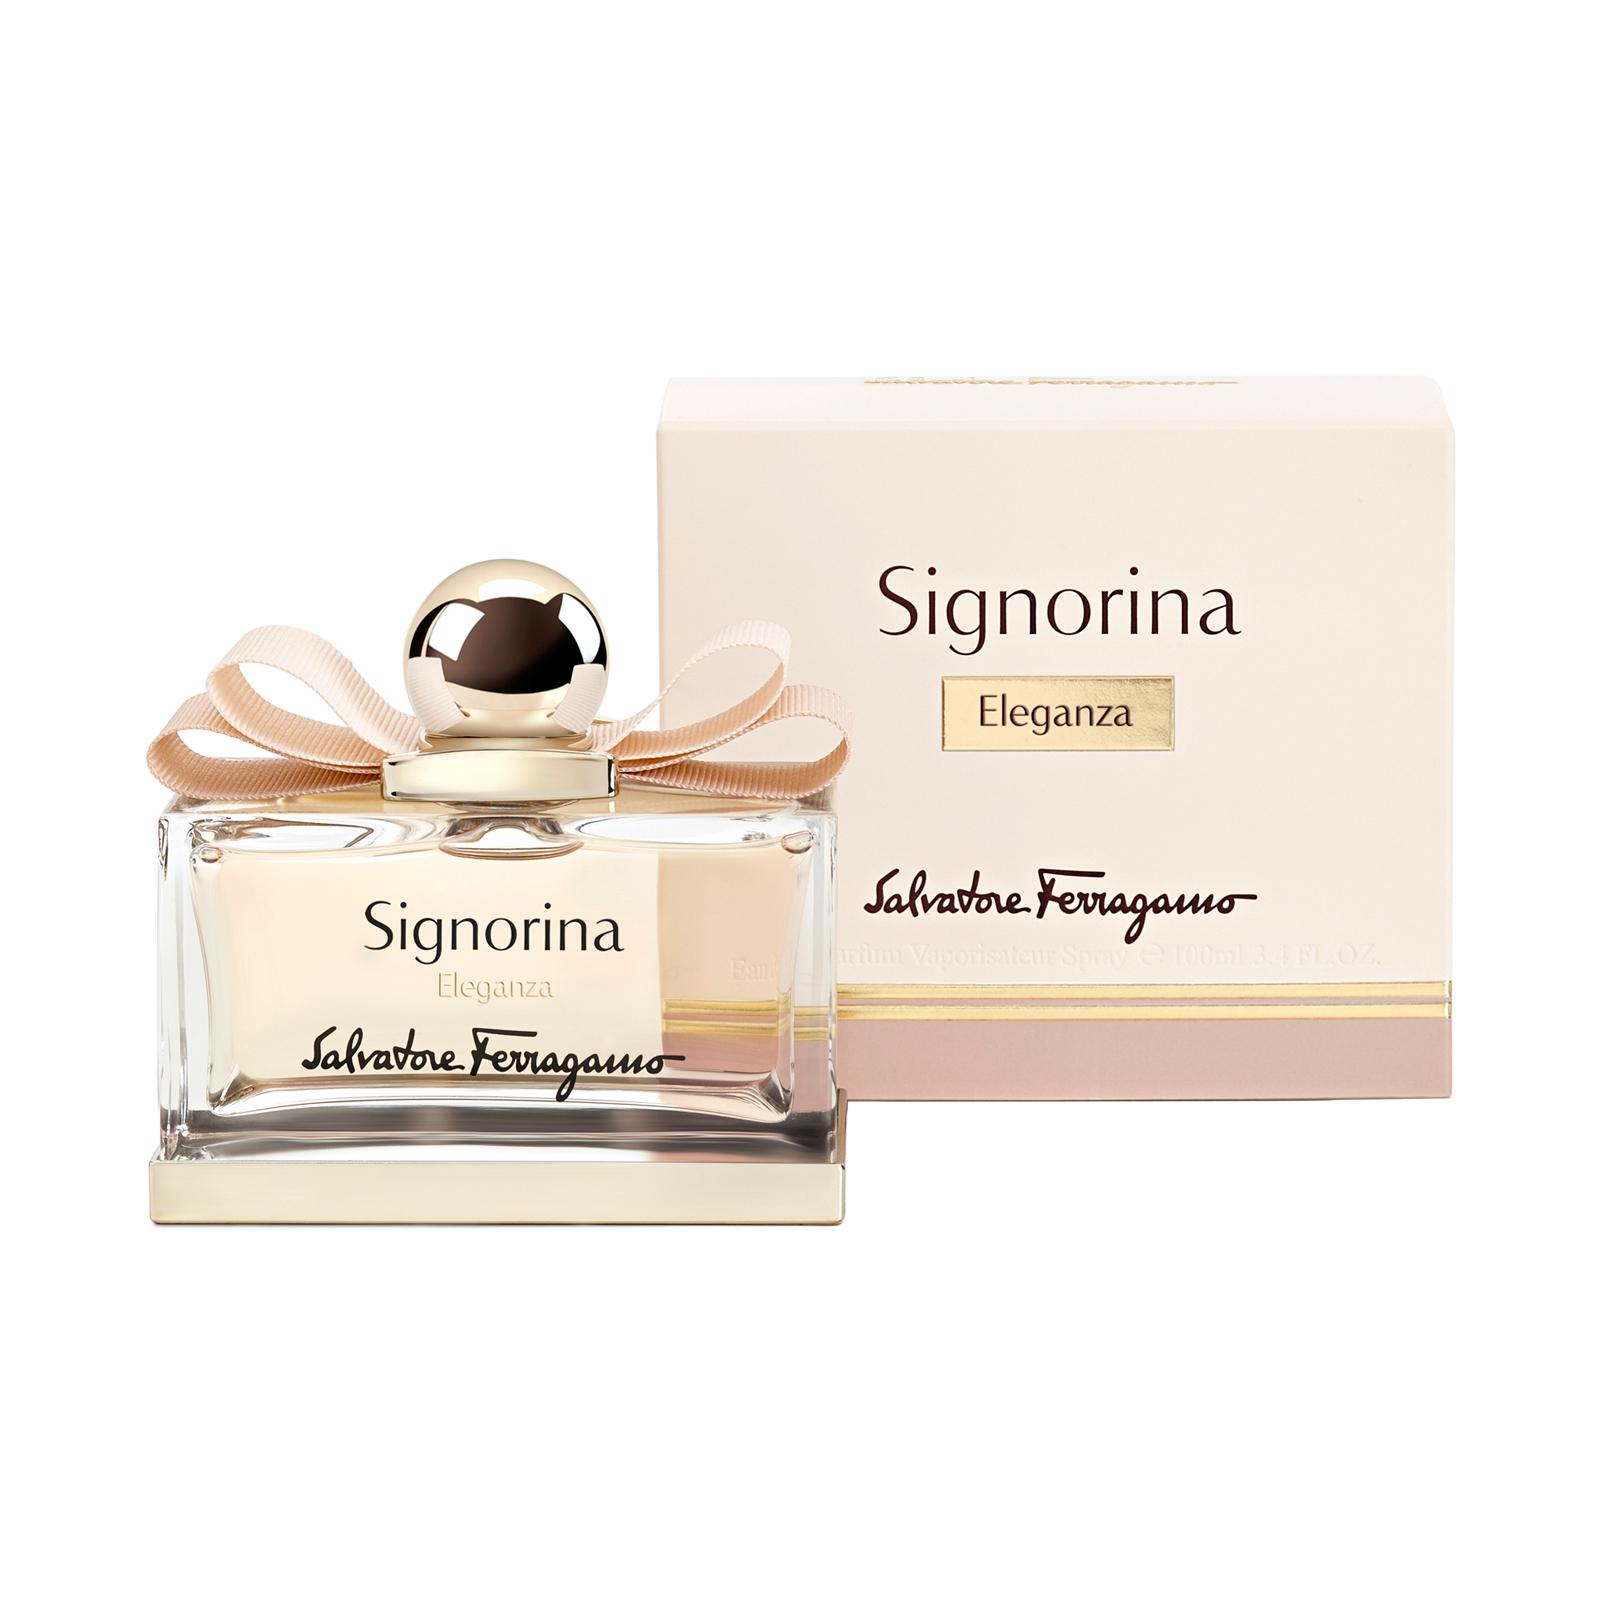 Salvatore Ferragamo Signorina Eleganza - parfémová voda W Objem: 30 ml